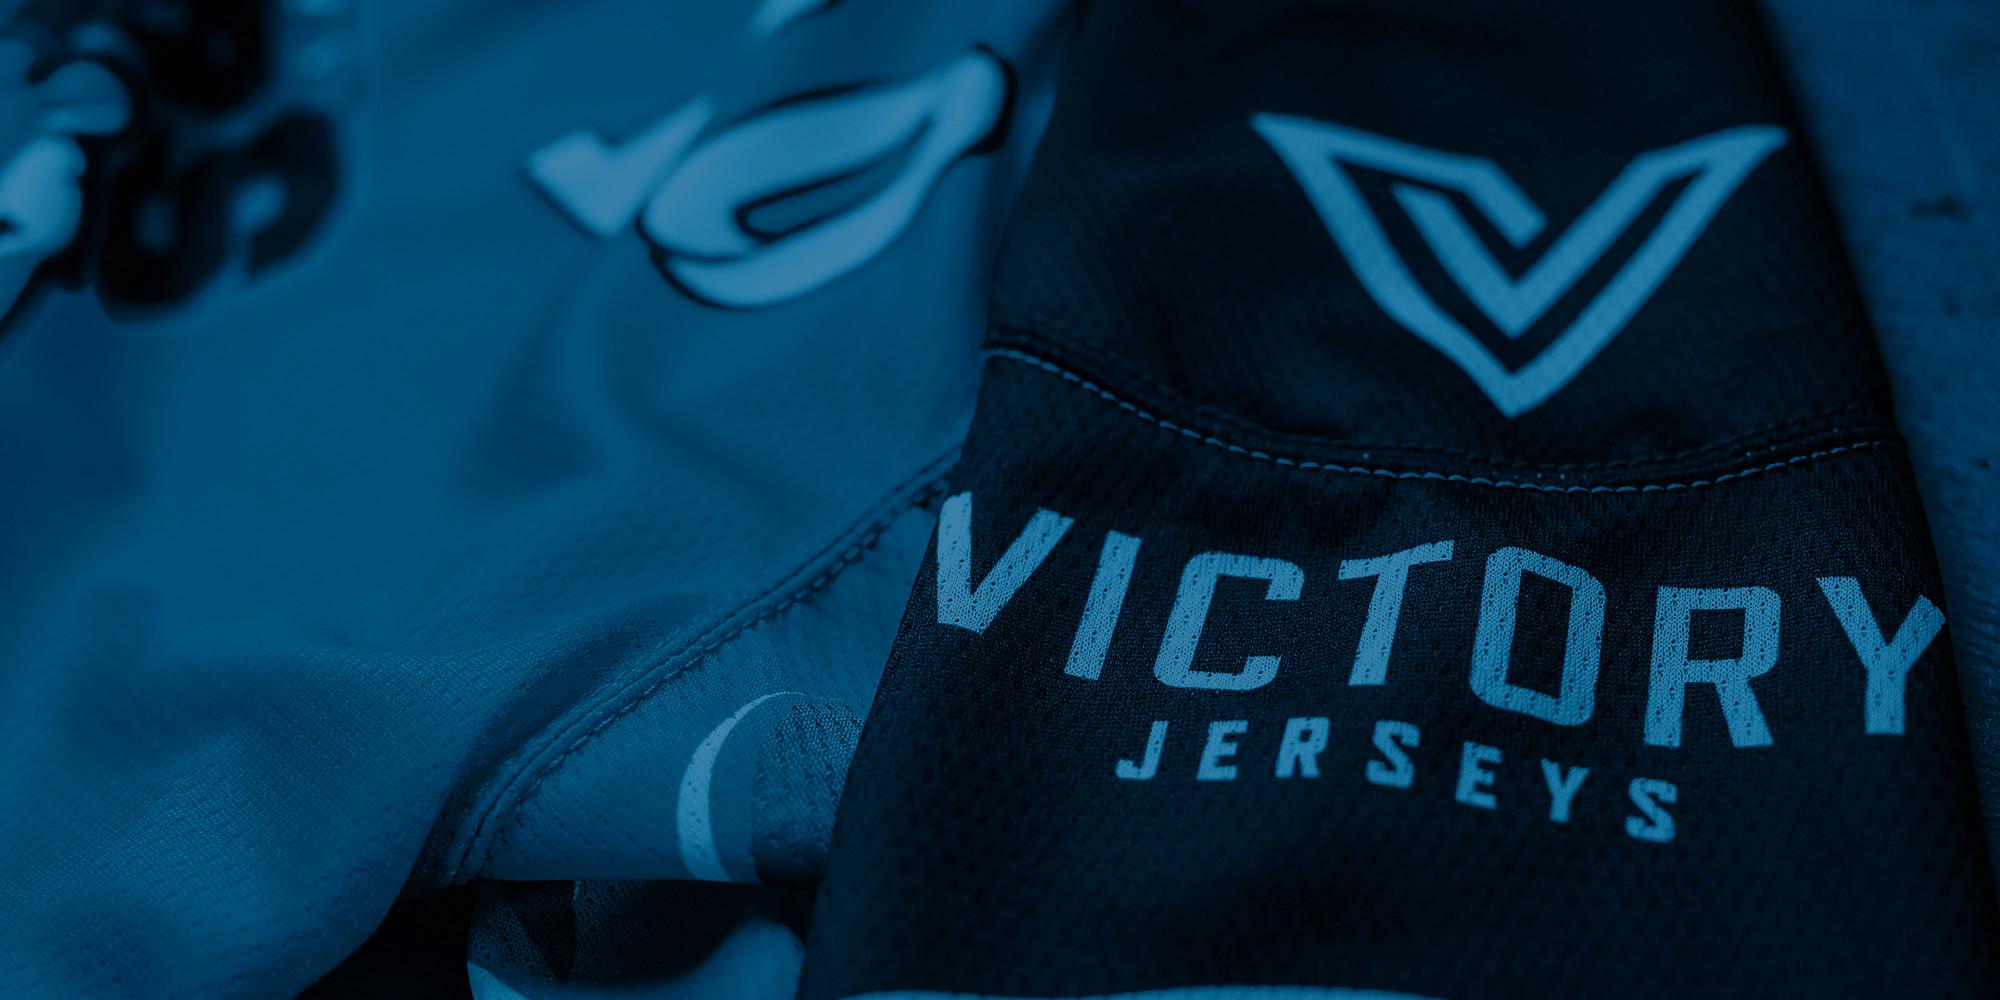 Victory Jerseys